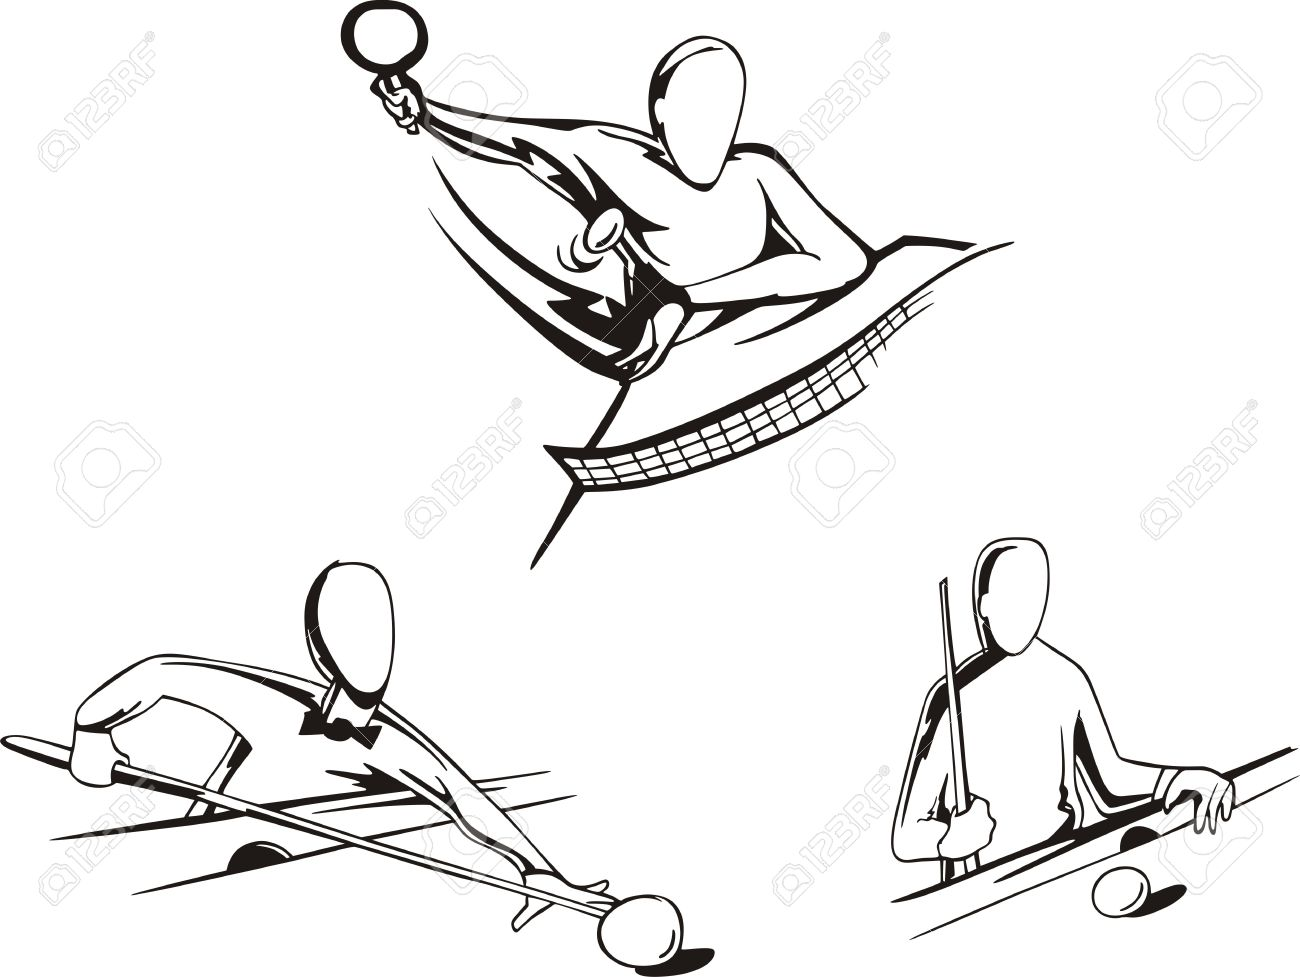 Pool Table Drawing At Getdrawings